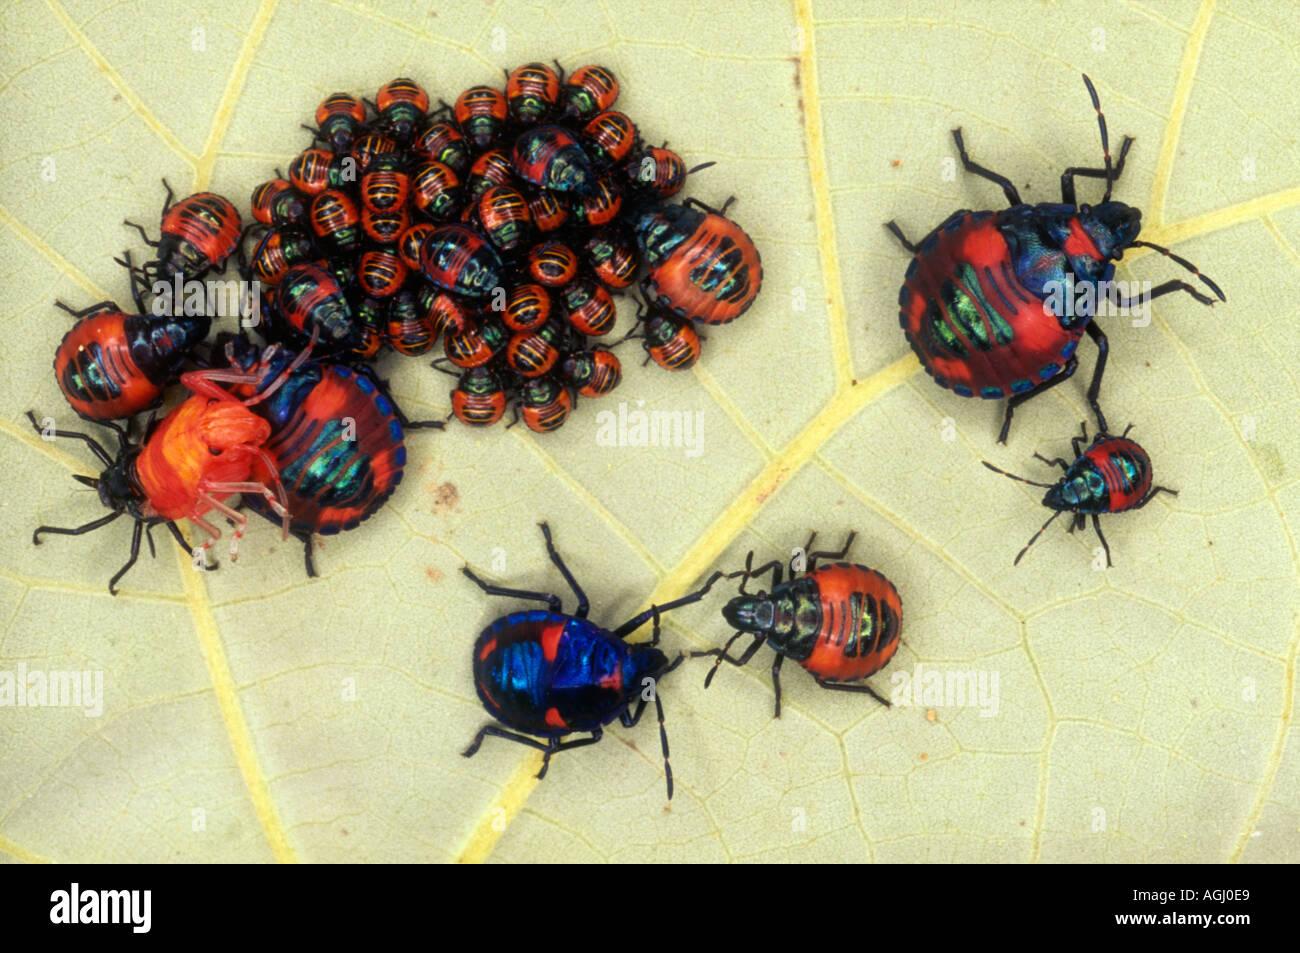 cotton-harlequin-bug-nymphstectocoris-diophthalmus-sheltering-under-AGJ0E9.jpg